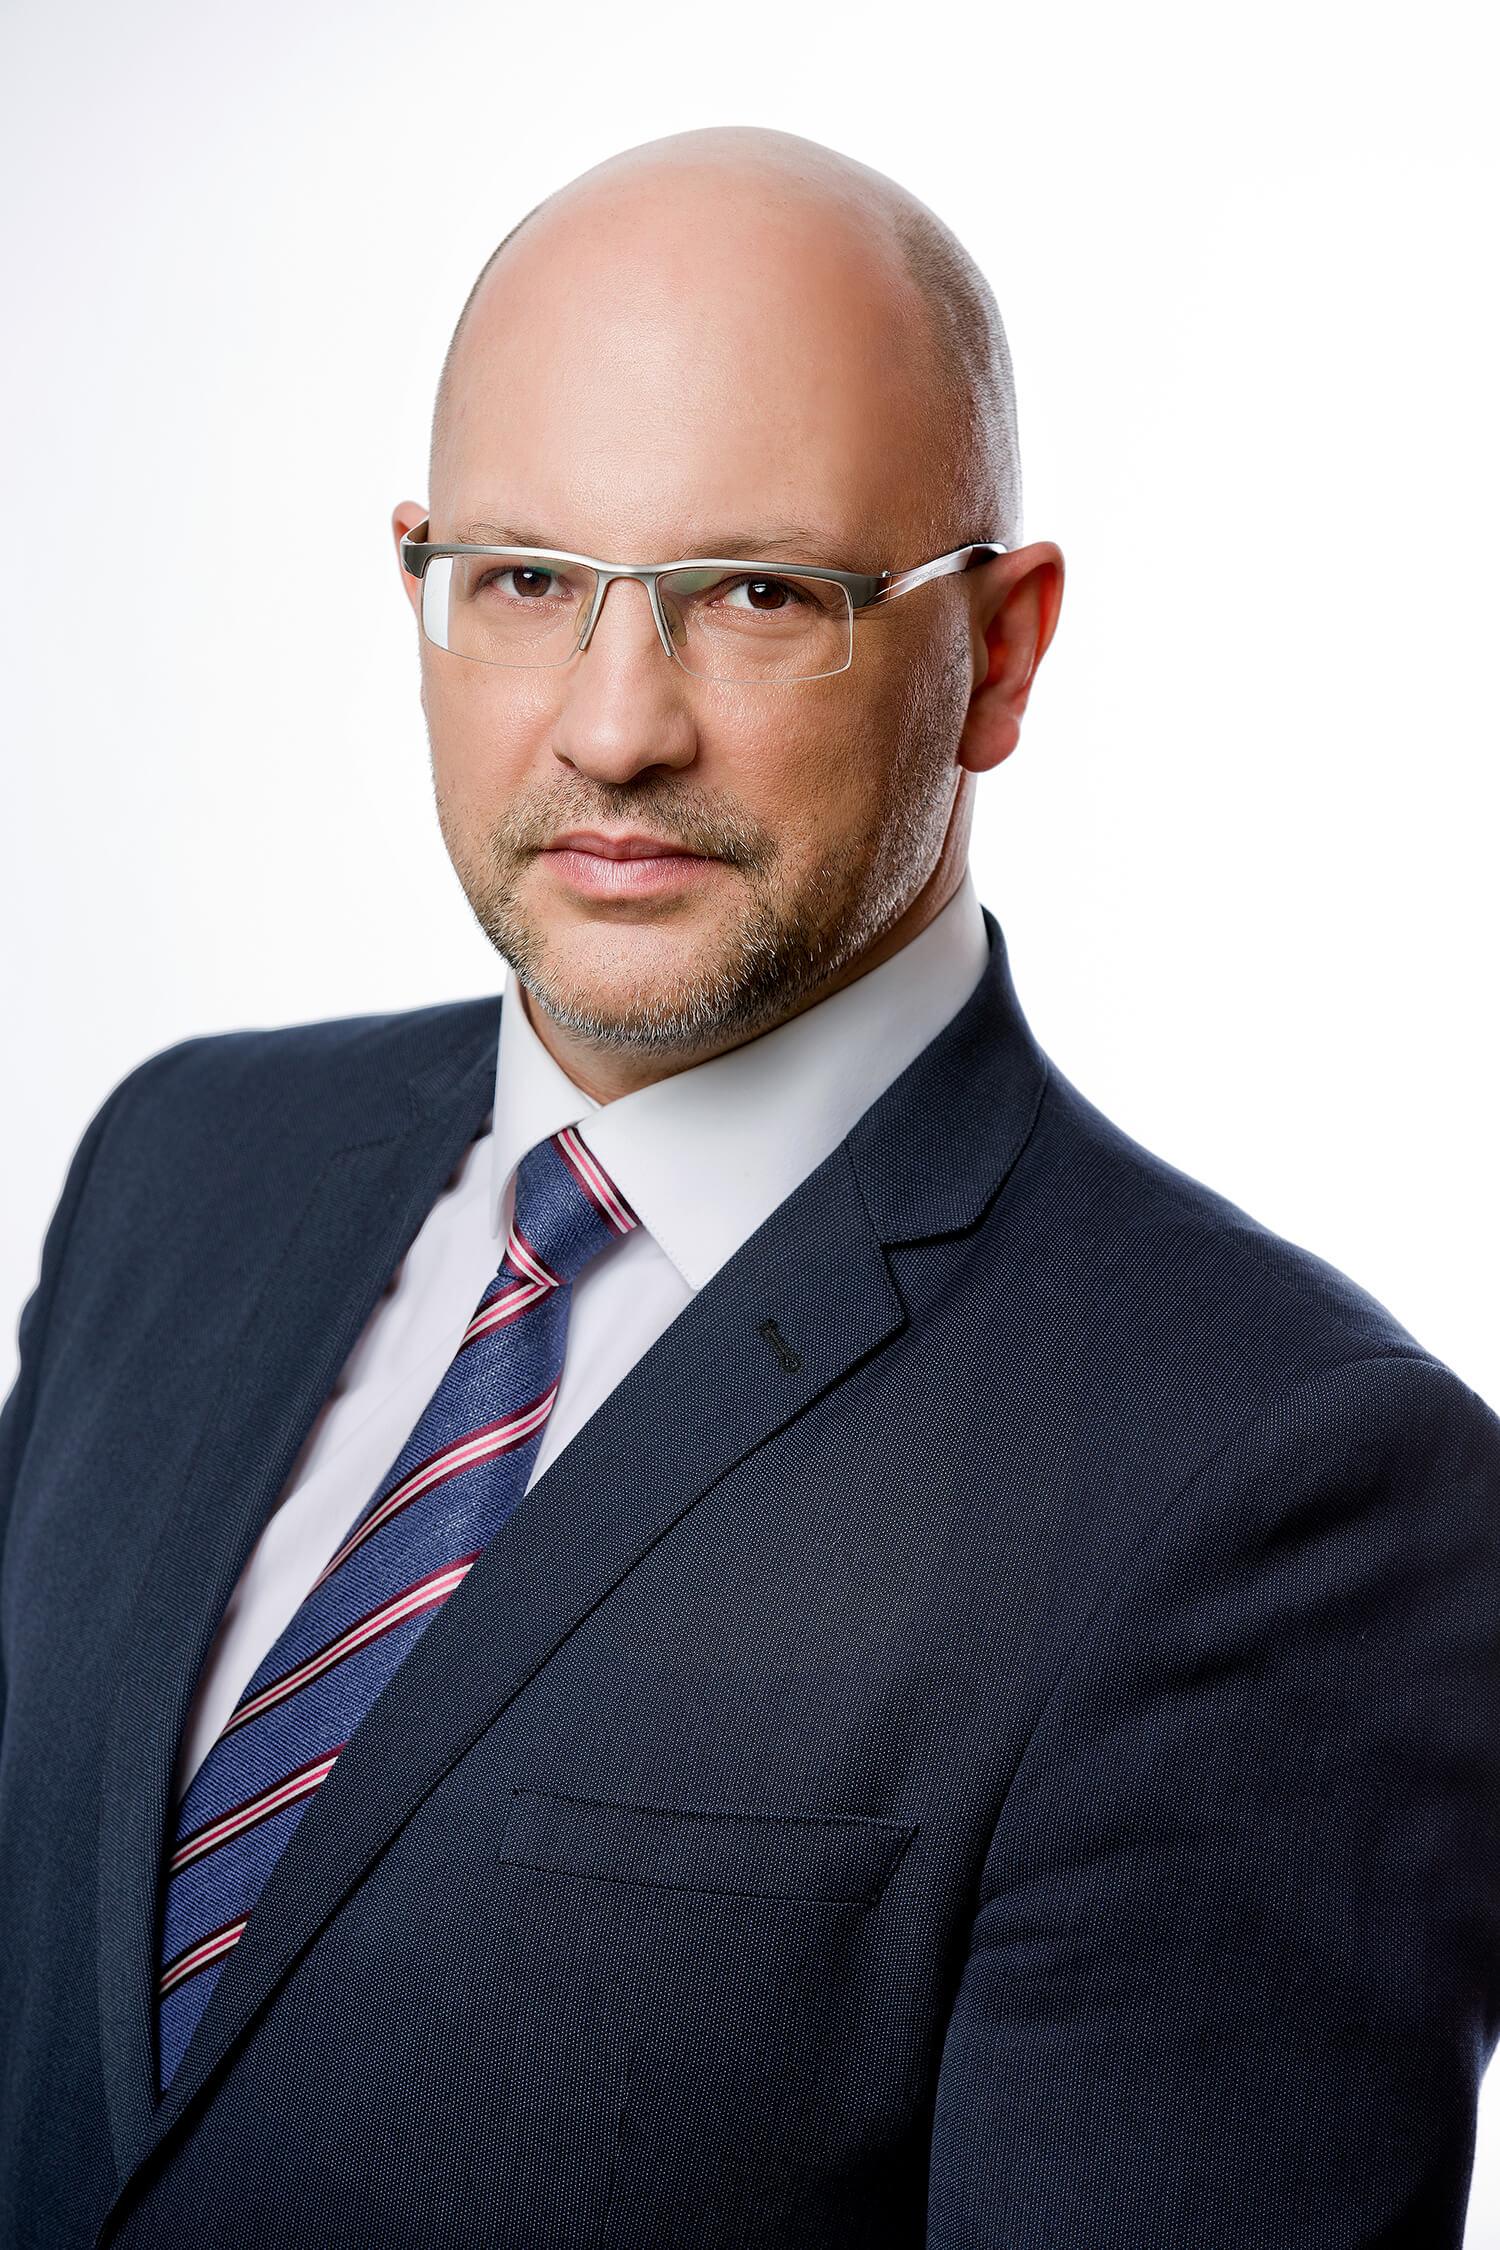 Малышев Игорь Александрович - директор ФРТП